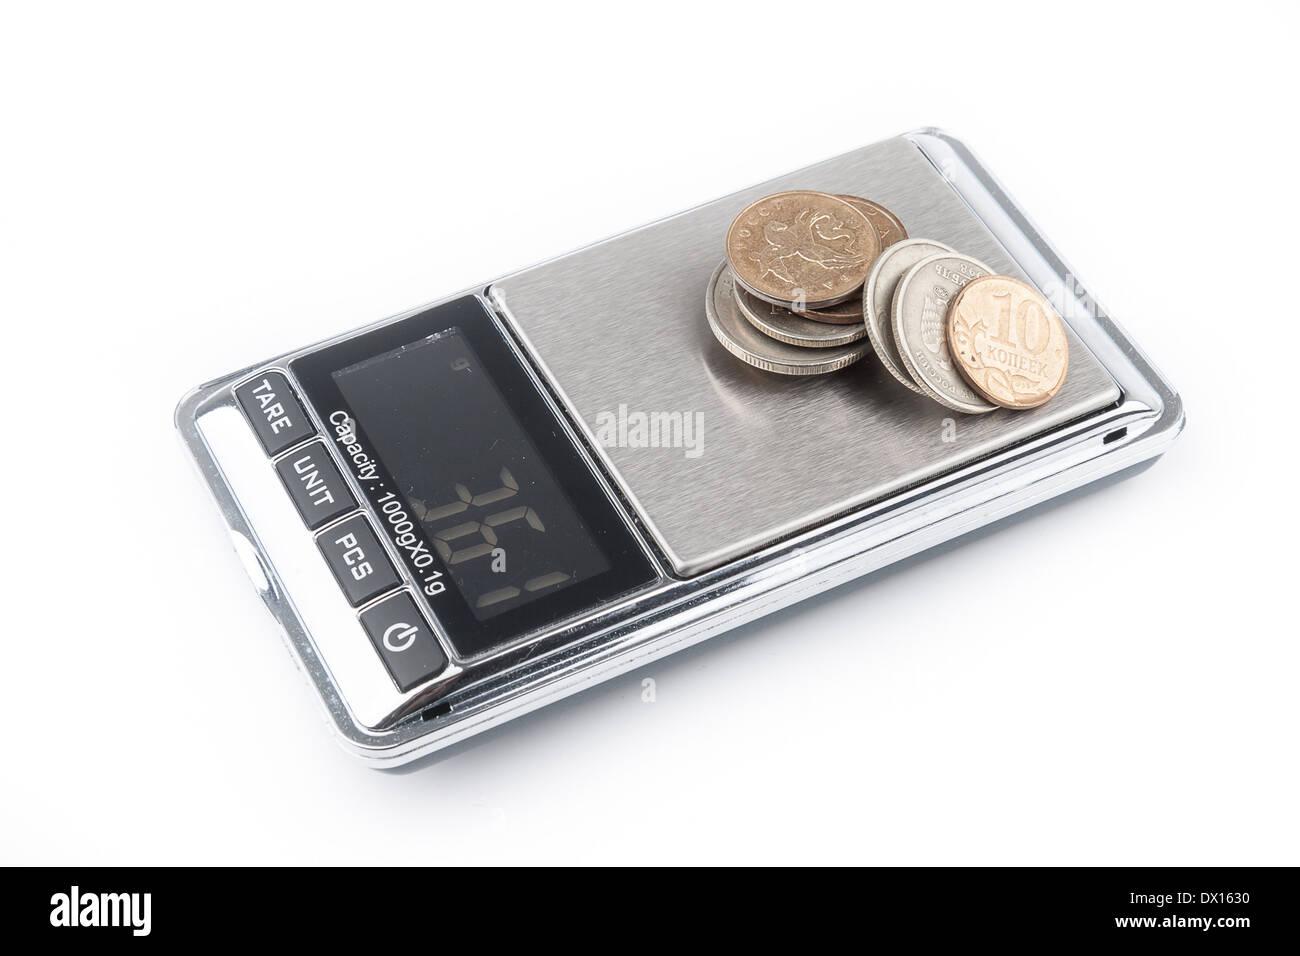 Digital scales isolated on white background - Stock Image